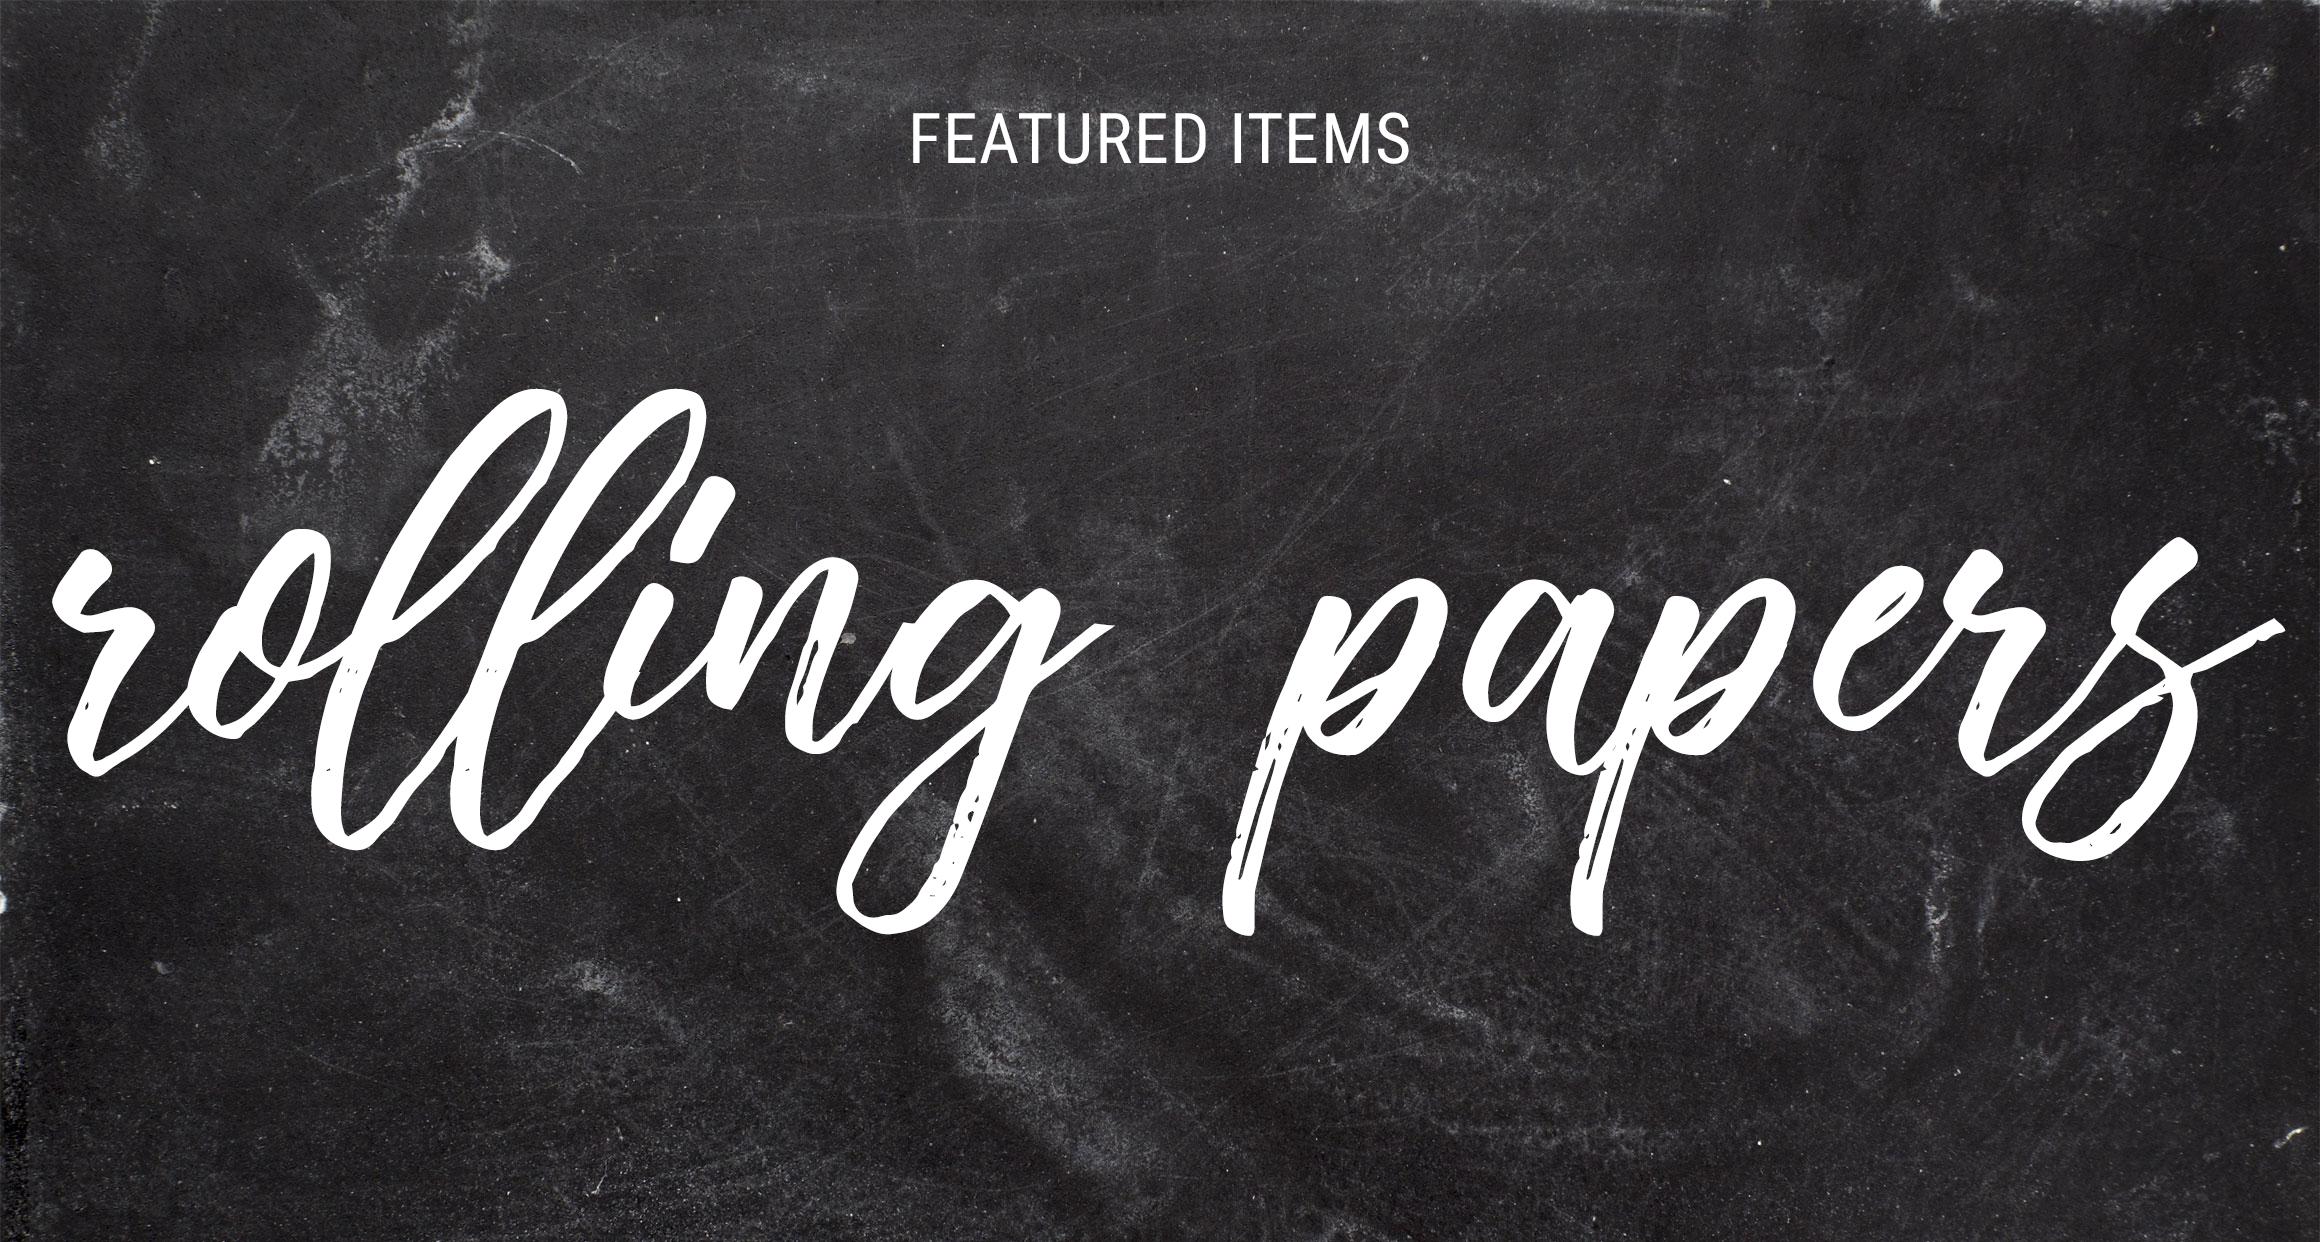 rollingpaper-featured.jpg